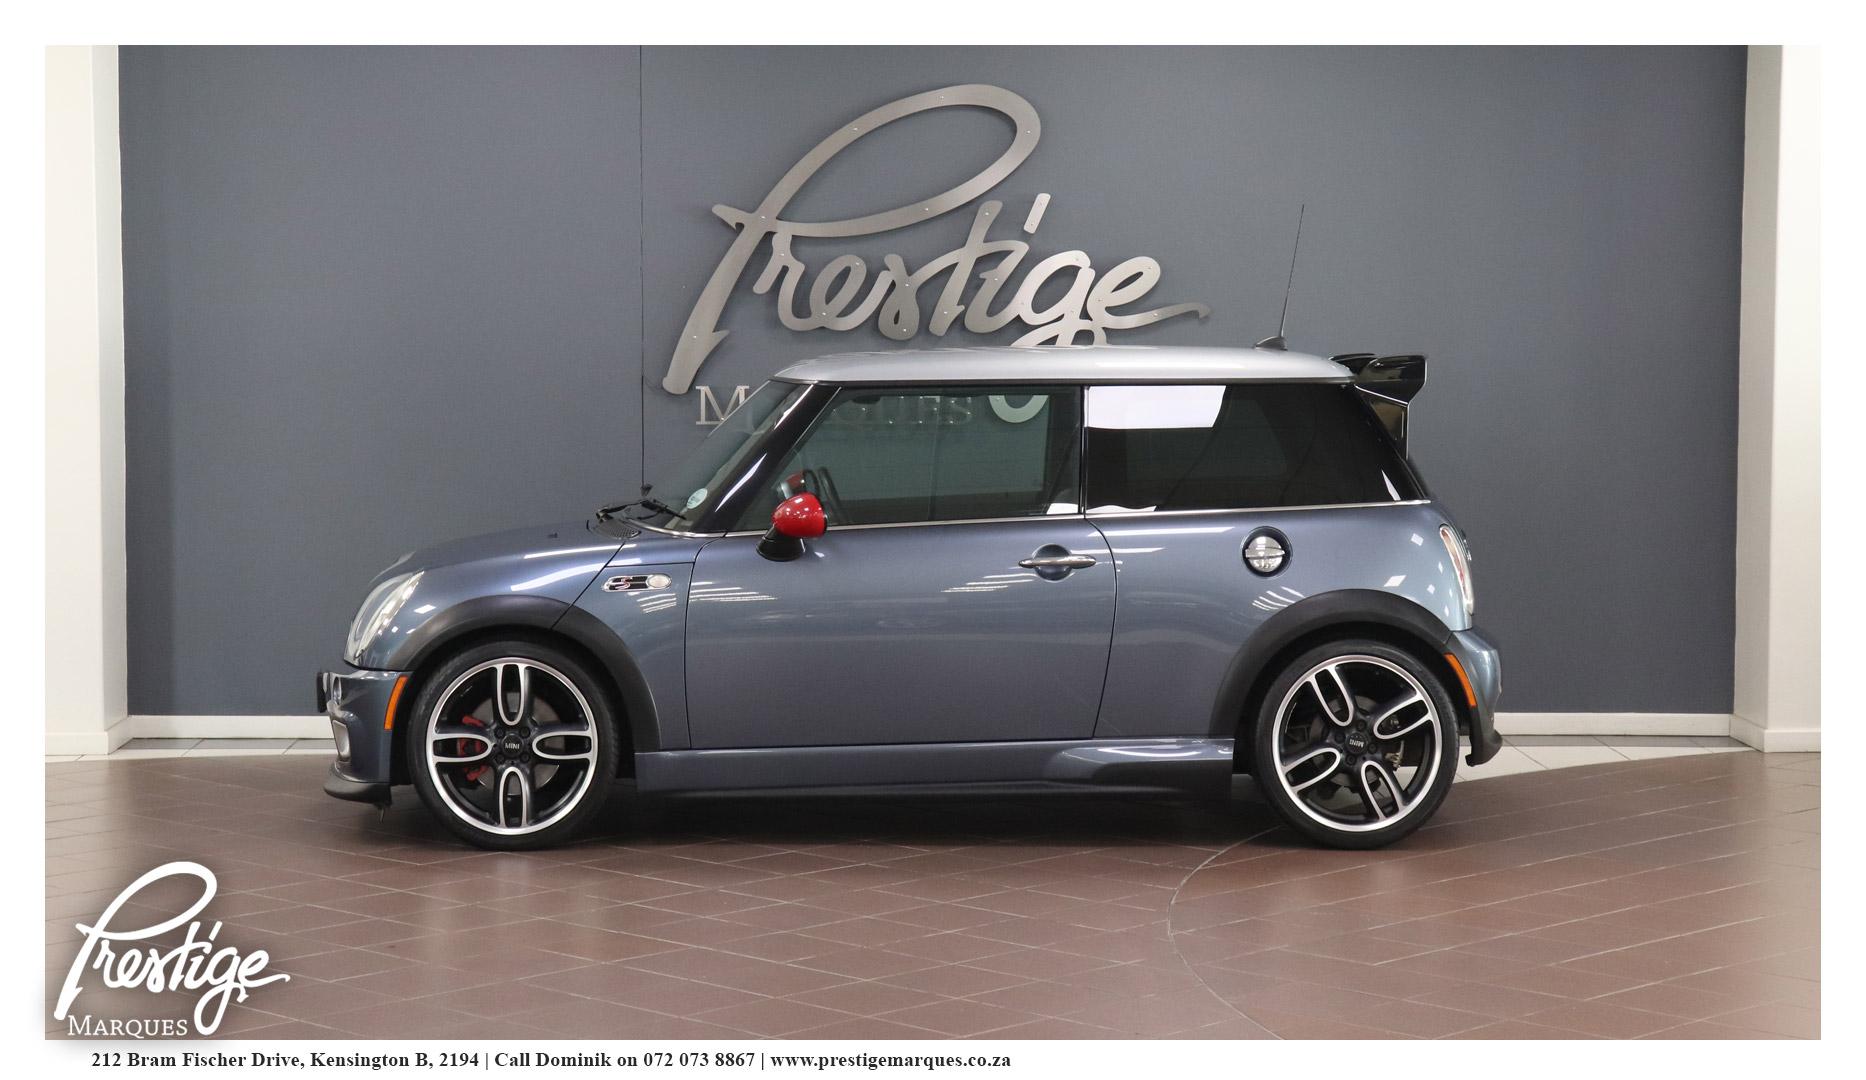 2006-Mini-Cooper-S-GP-Johon-Cooper-Works- Prestige-Marques-Randburg-Sandton-7